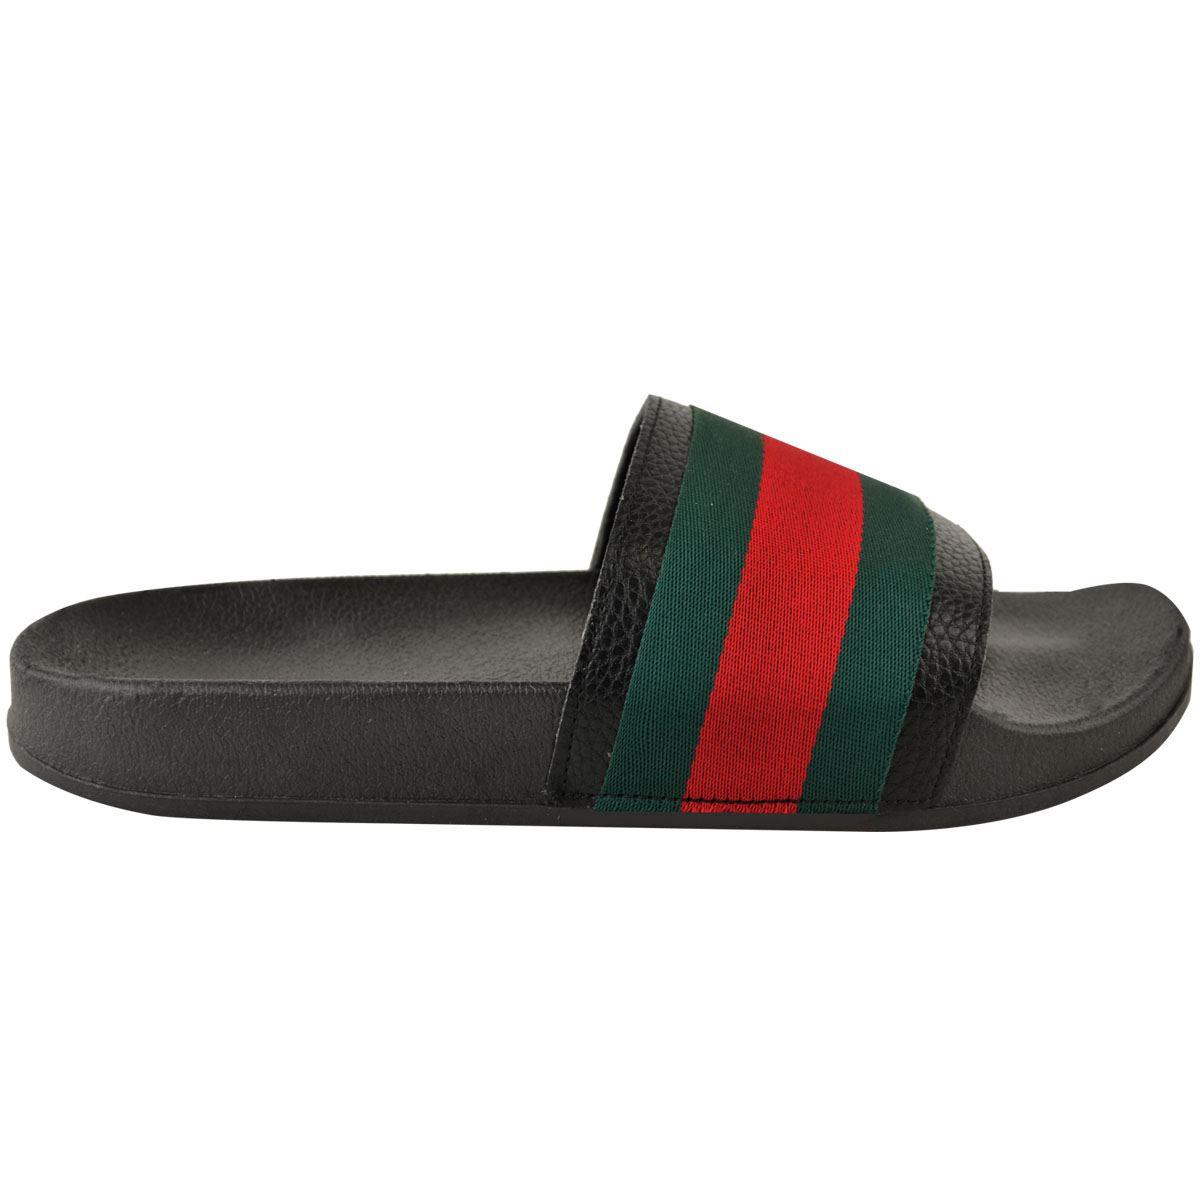 Womens-Striped-Sliders-Slides-Flat-Slip-On-Mules-Summer-Fashion-Sandals-Shoes-Sz thumbnail 4